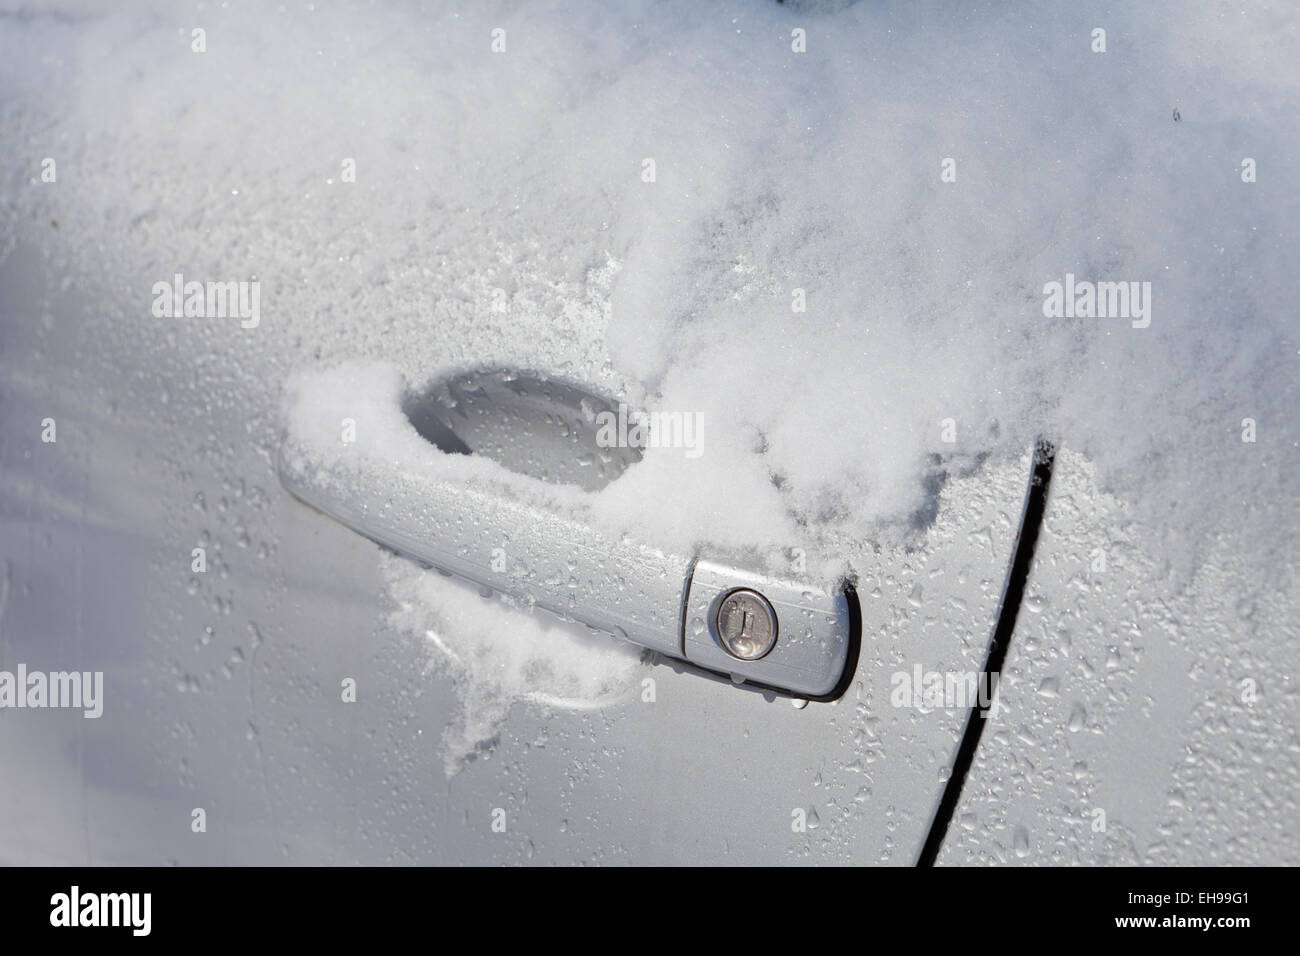 Snow on car door handle - Virginia USA - Stock Image